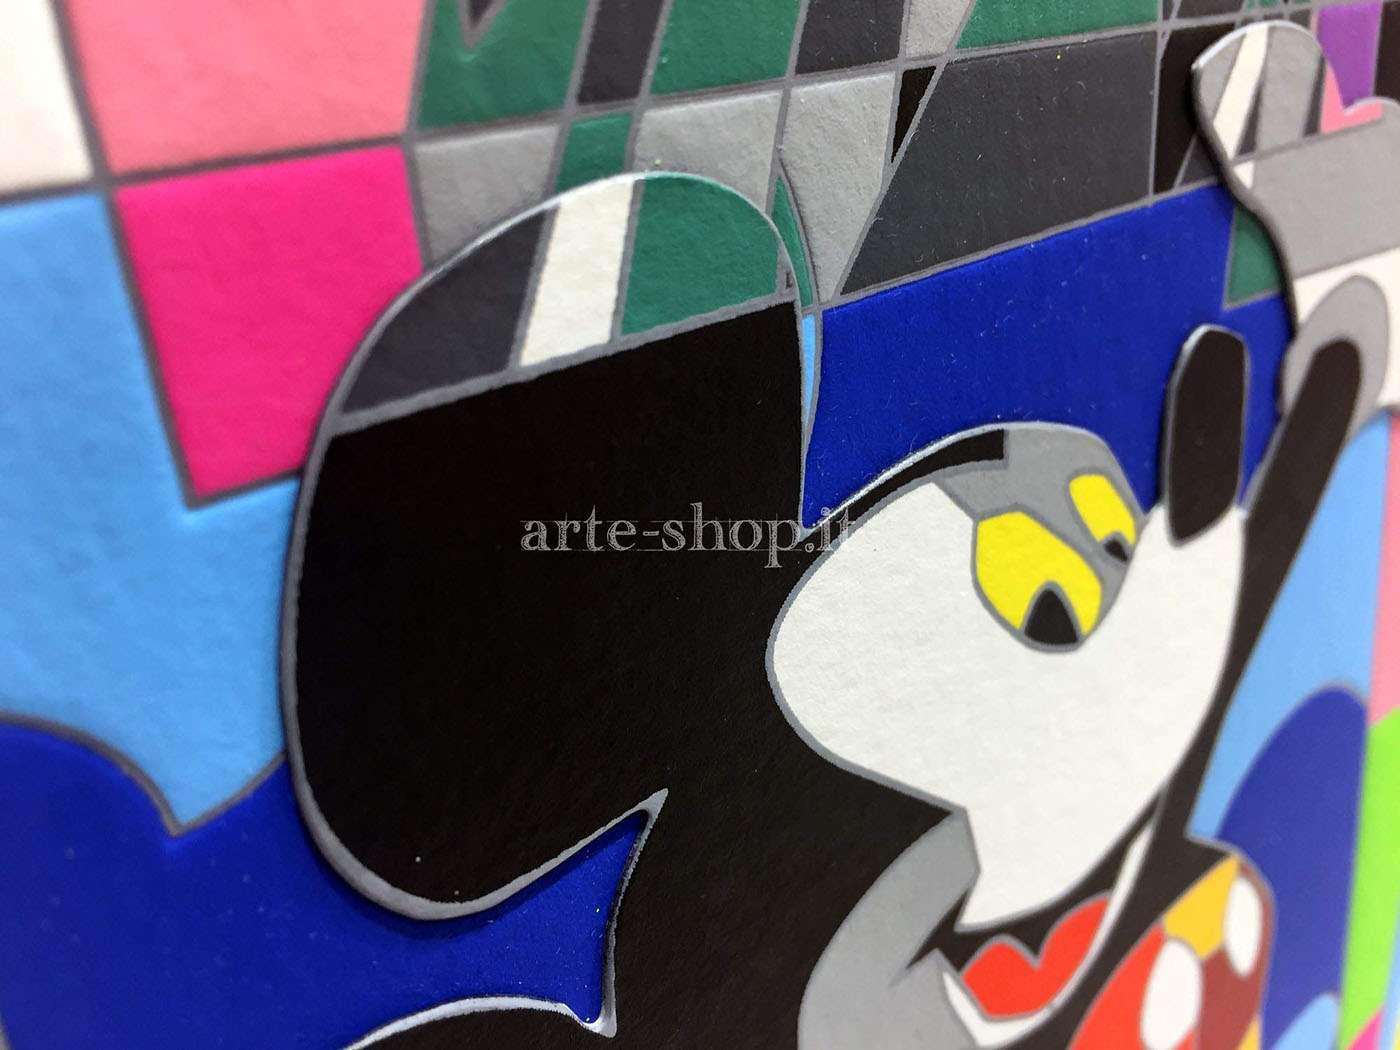 arte pentagono shop dettaglio numero 252